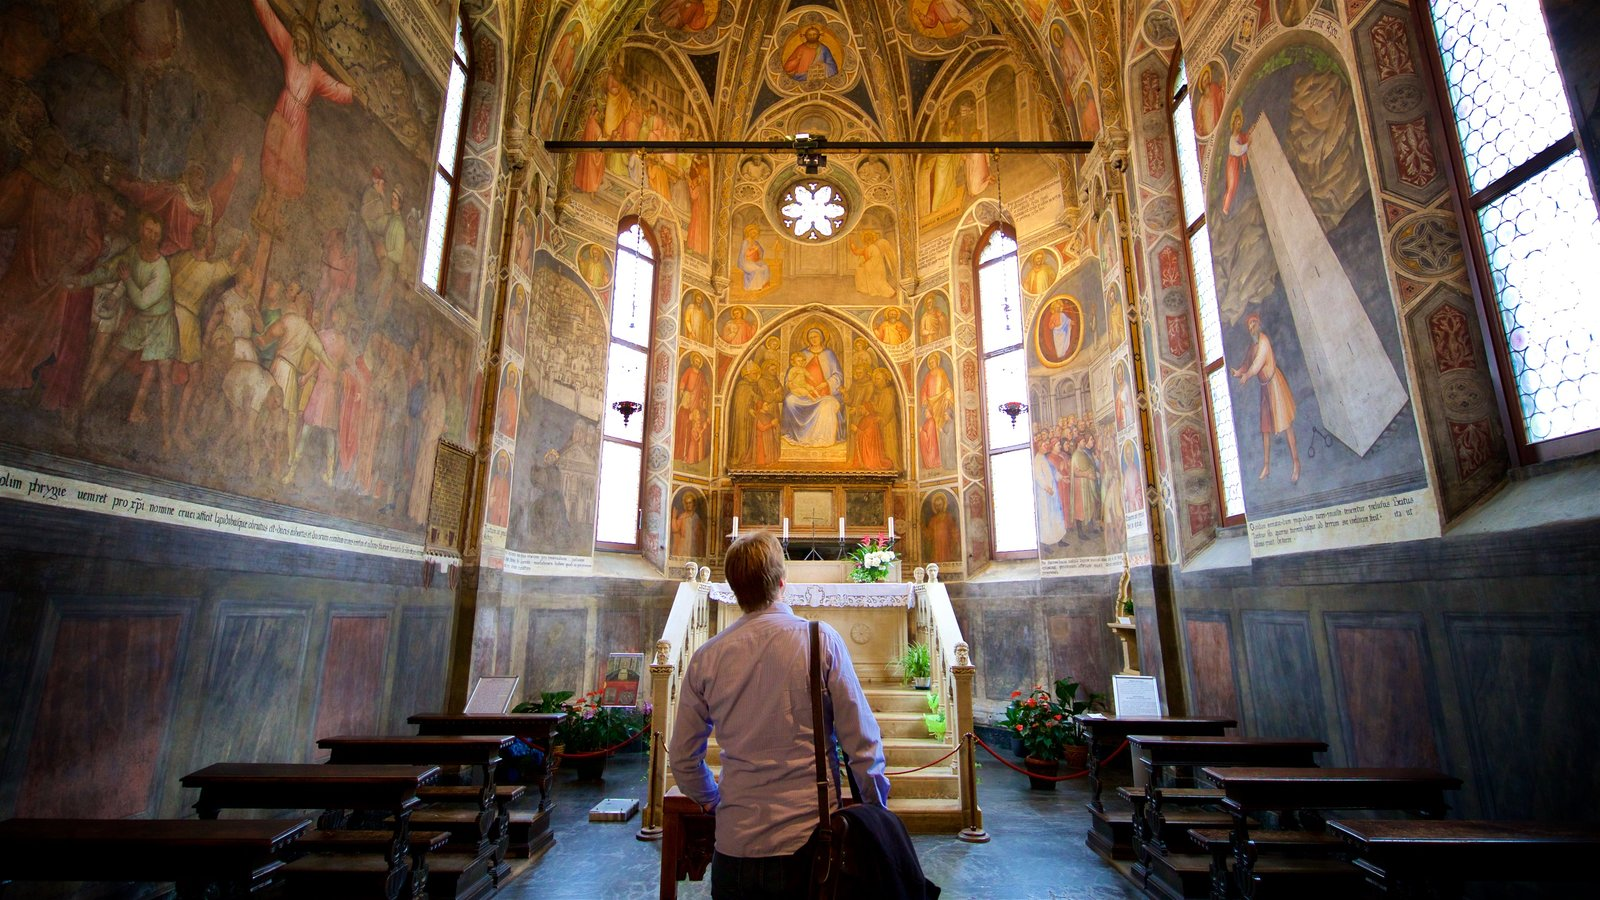 Basilica di Sant\'Antonio da Padova showing interior views, art and heritage elements